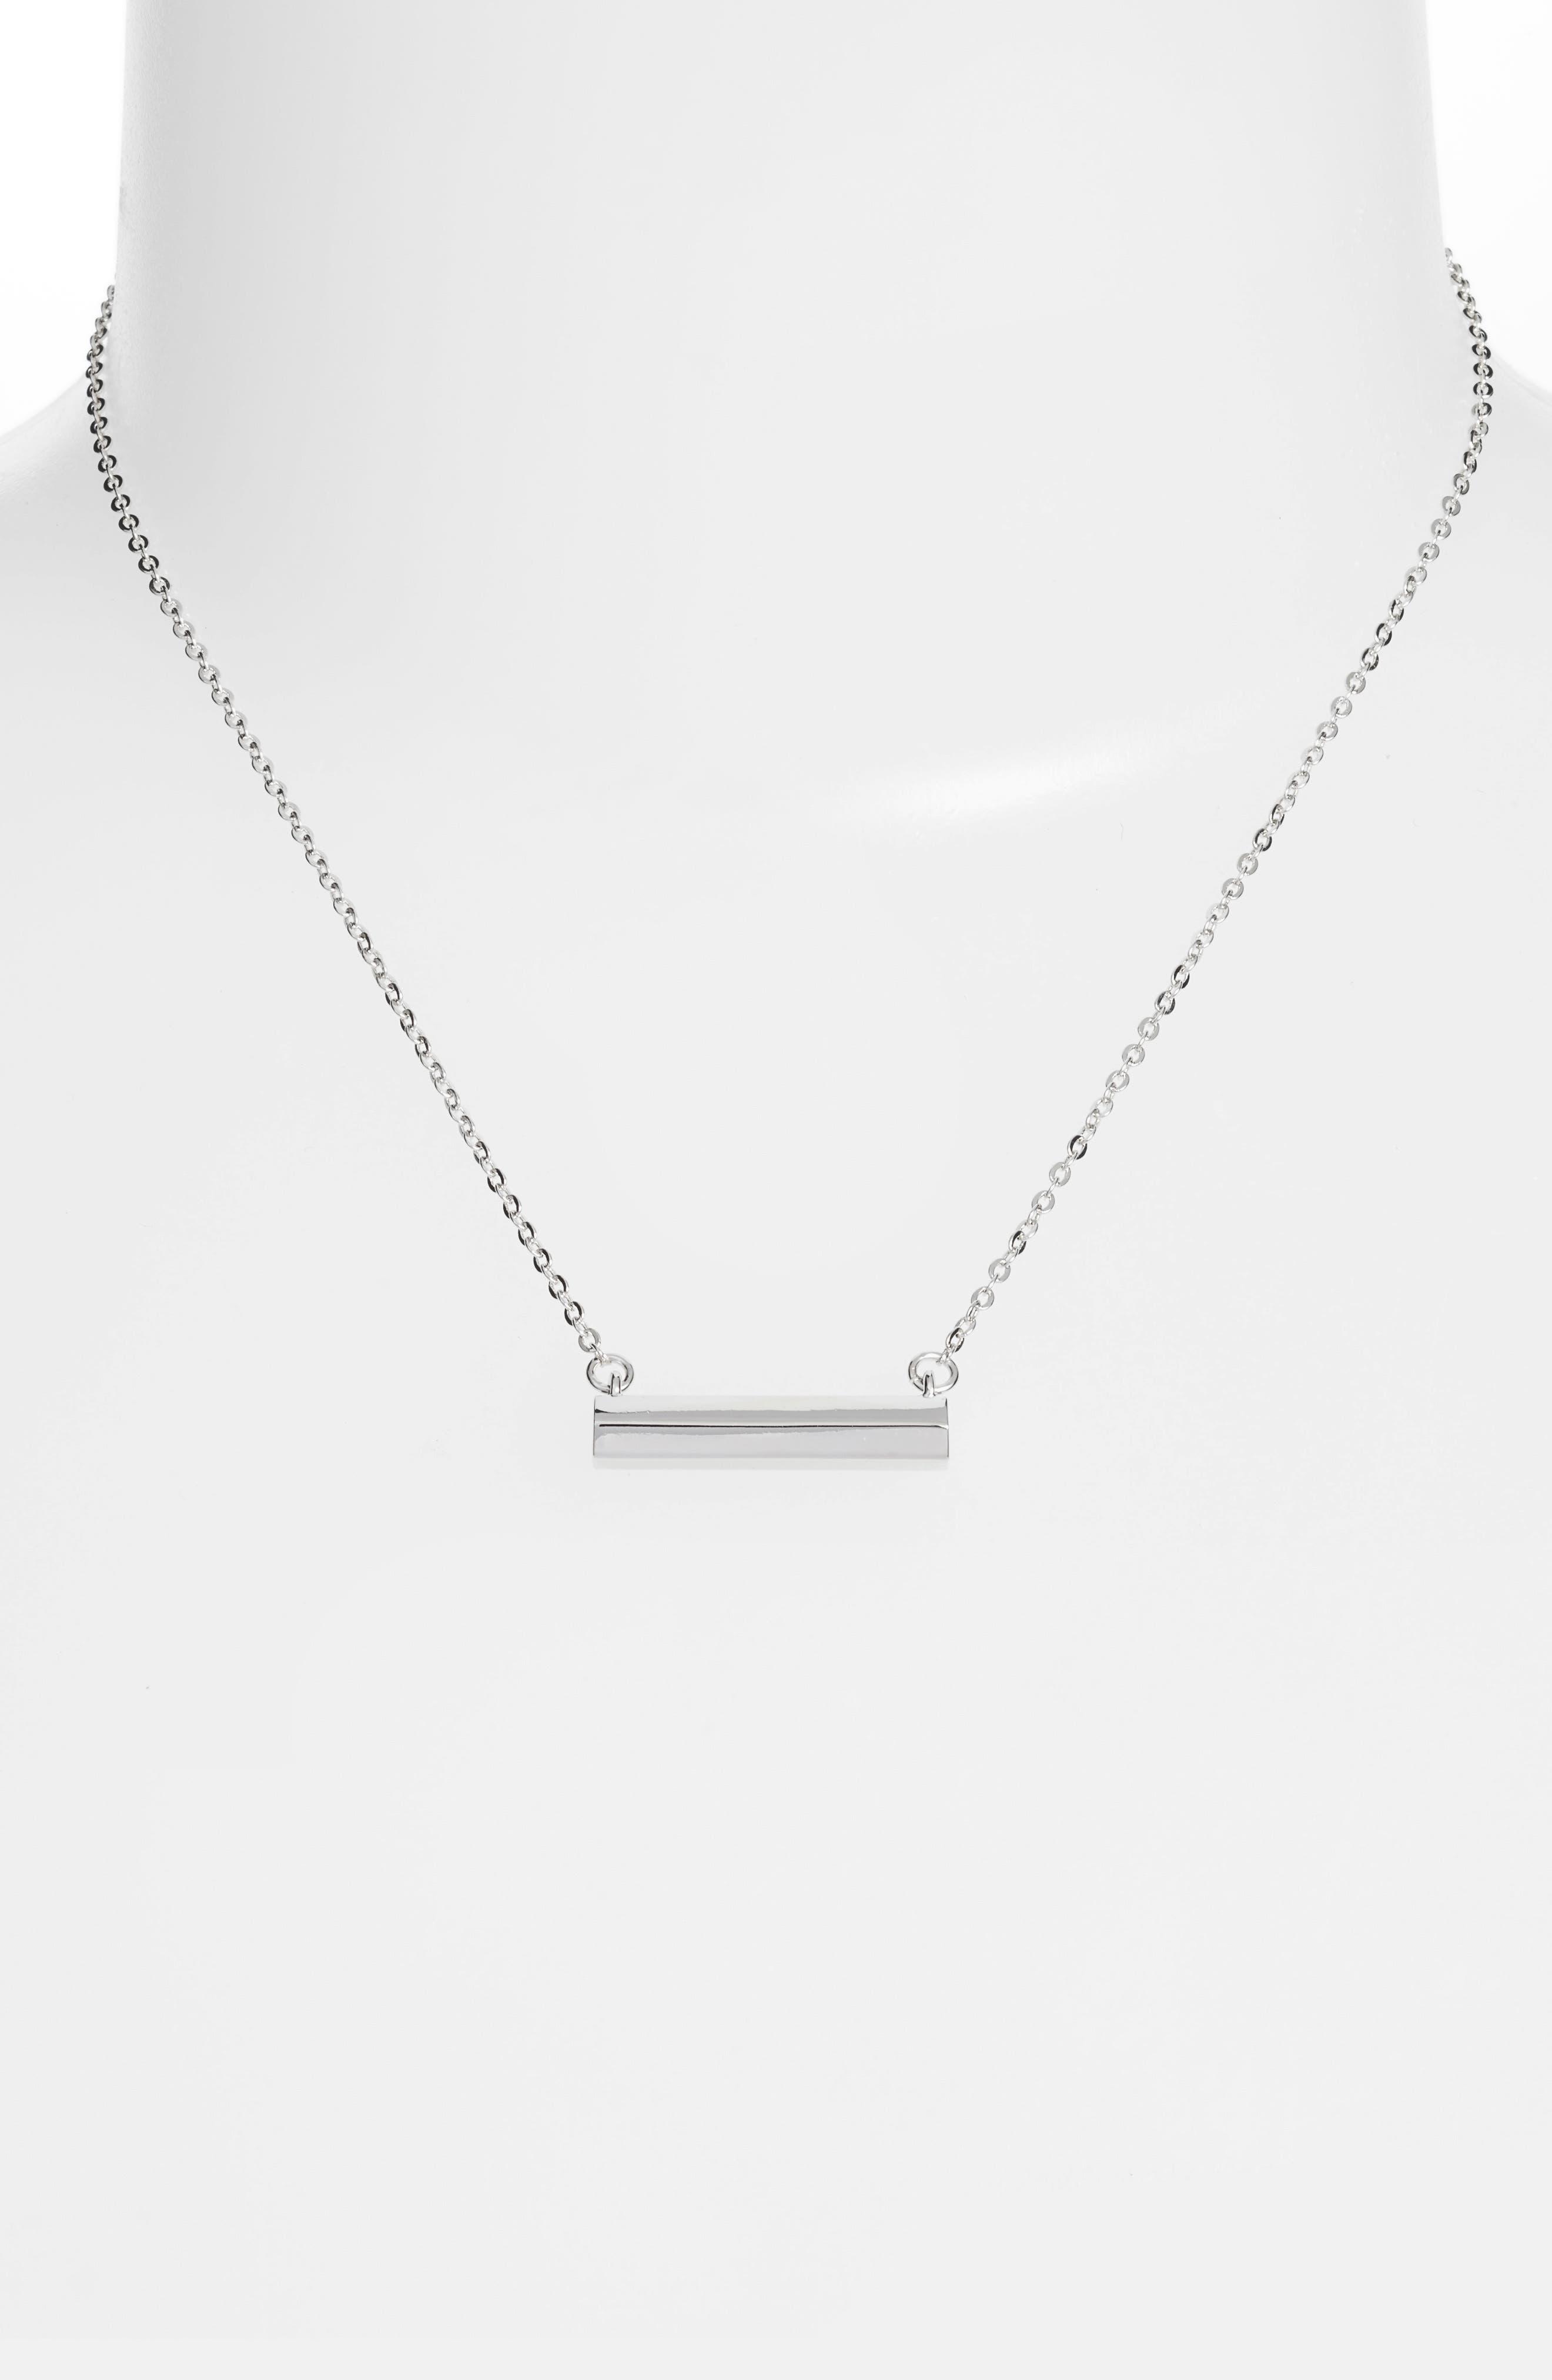 Hexagon Shaped Bar Pendant Necklace,                             Alternate thumbnail 2, color,                             040